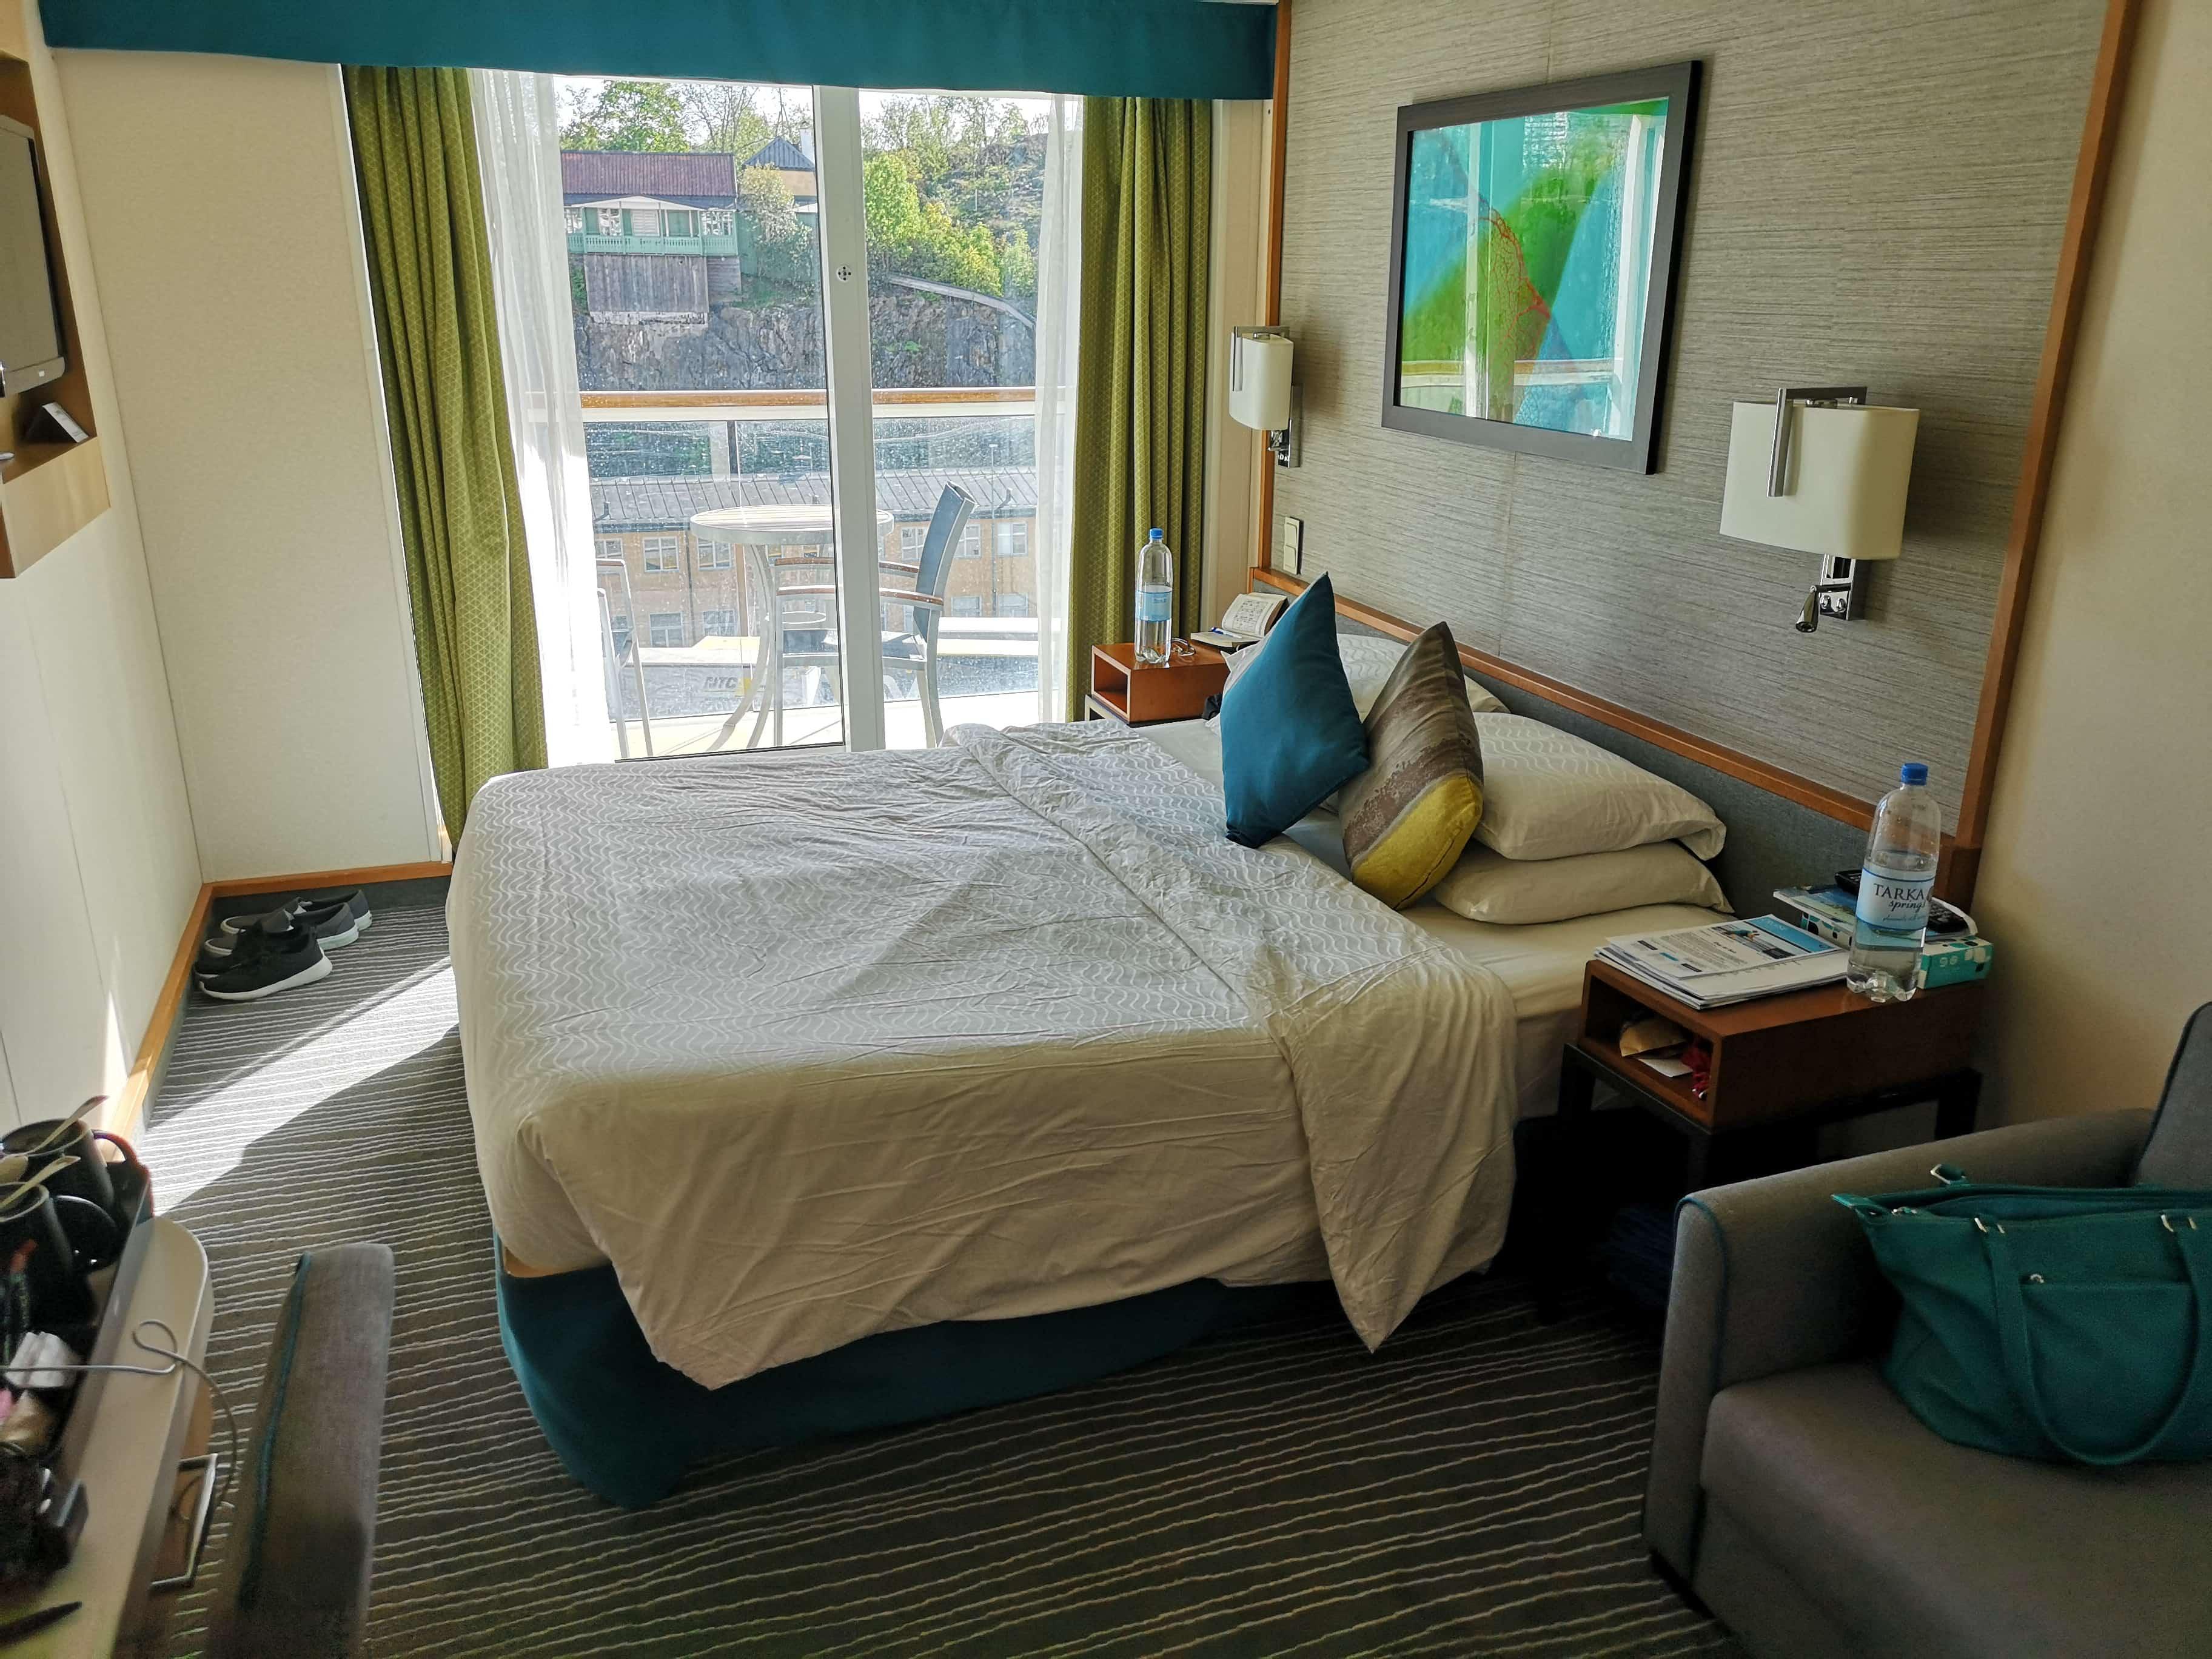 Marella Discovery Balcony Cabin Bed Chair Desk TV